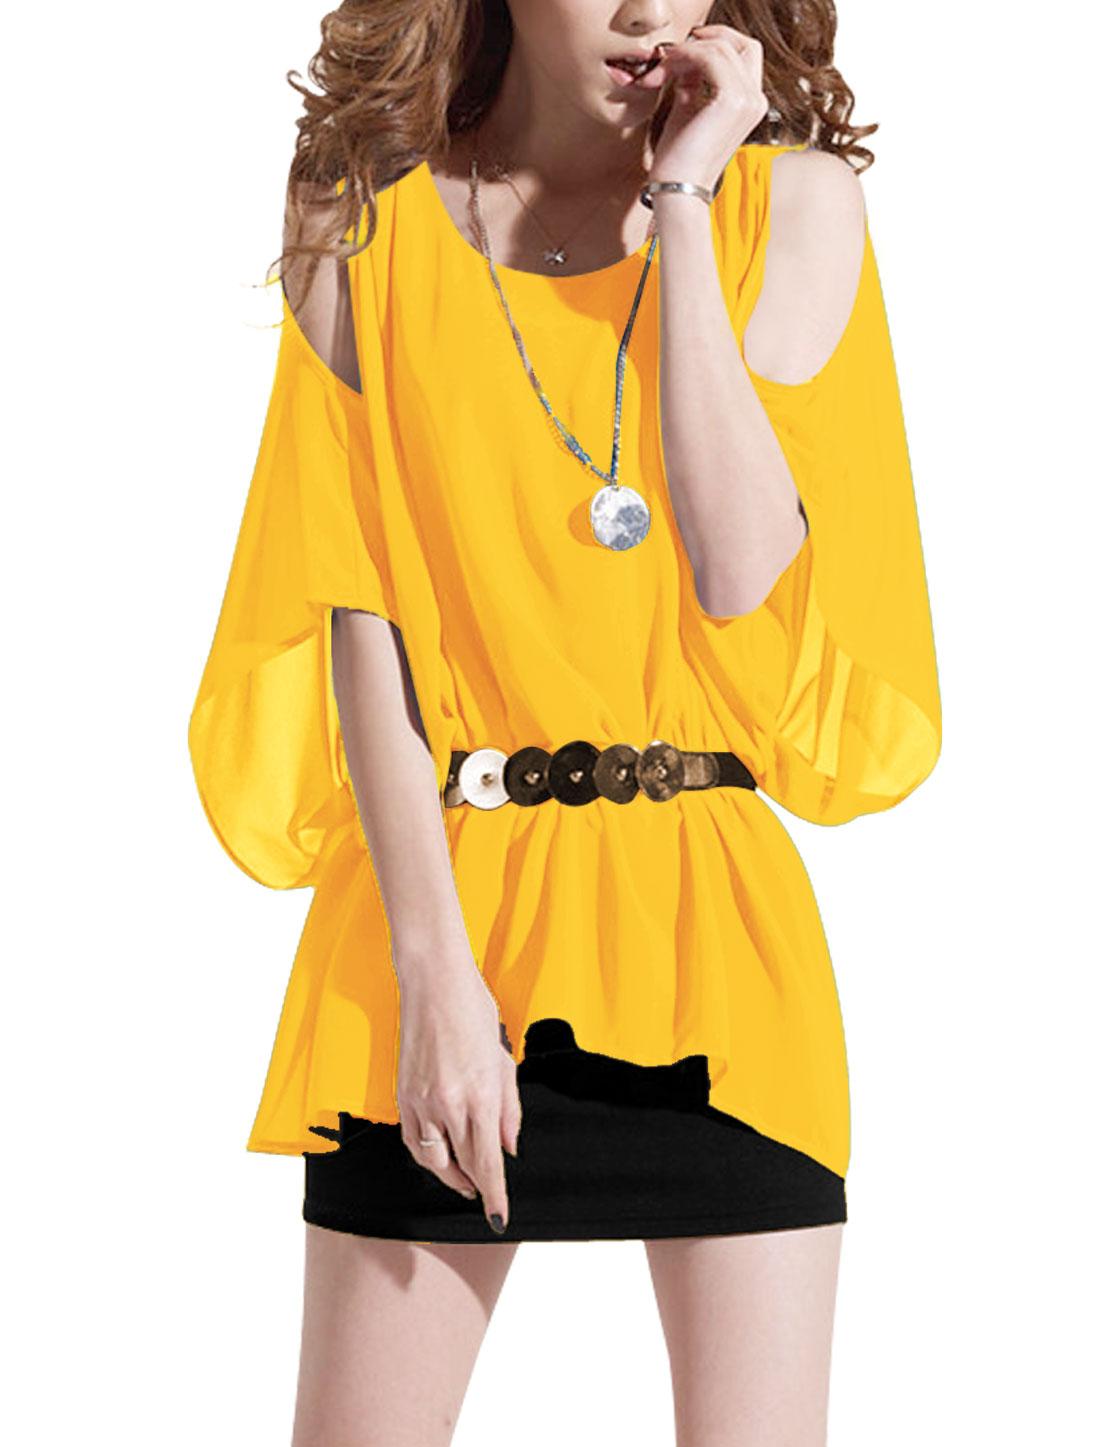 Lady Yellow Black Cut Out Shoulder Above Knee Blouson Dress w Waist Strap S